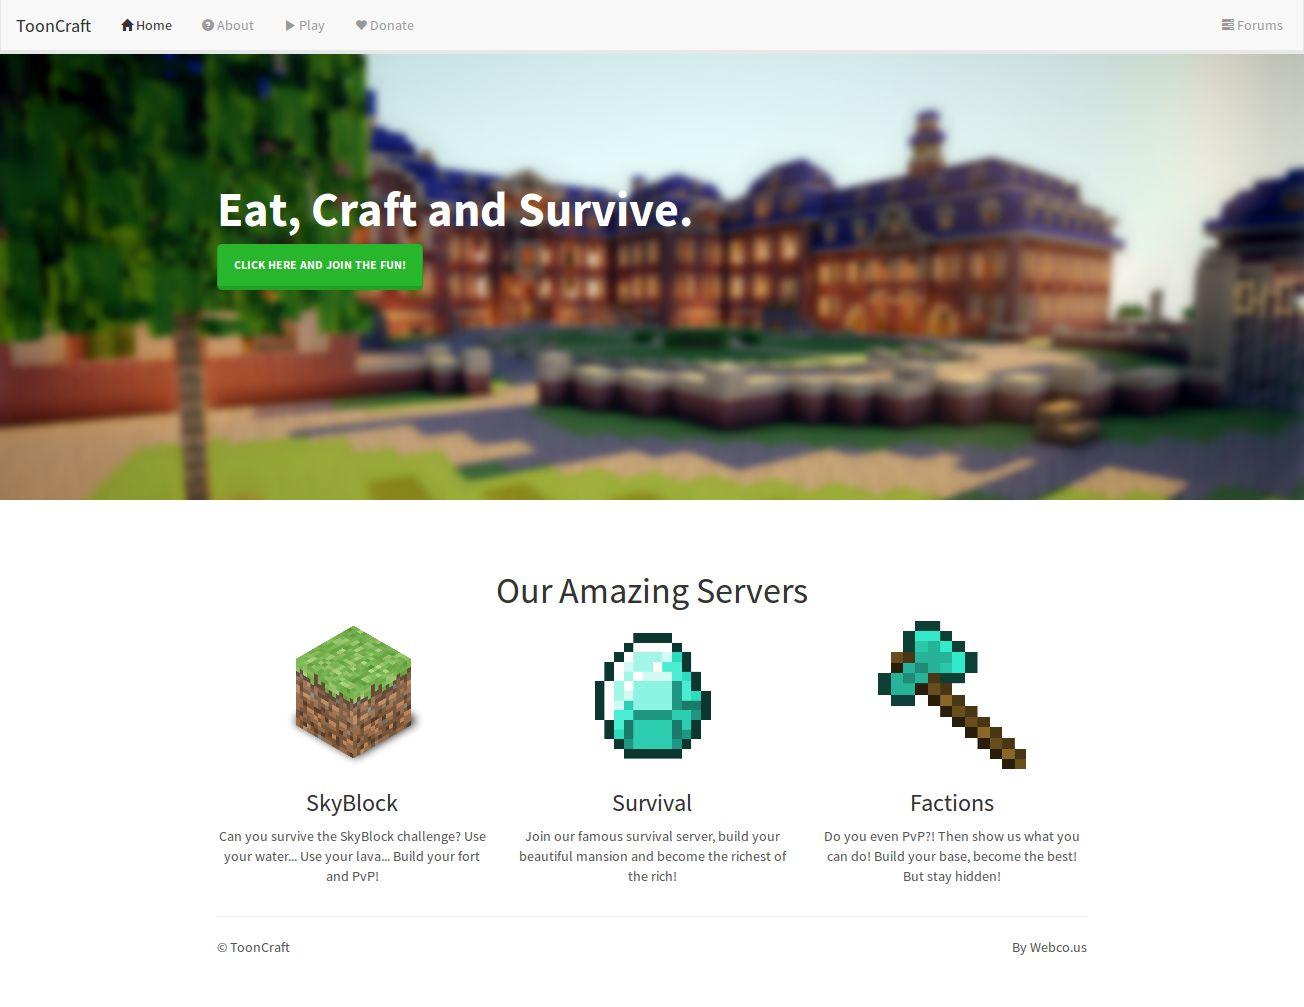 tooncraft minecraft website template minecraft website templates. Black Bedroom Furniture Sets. Home Design Ideas